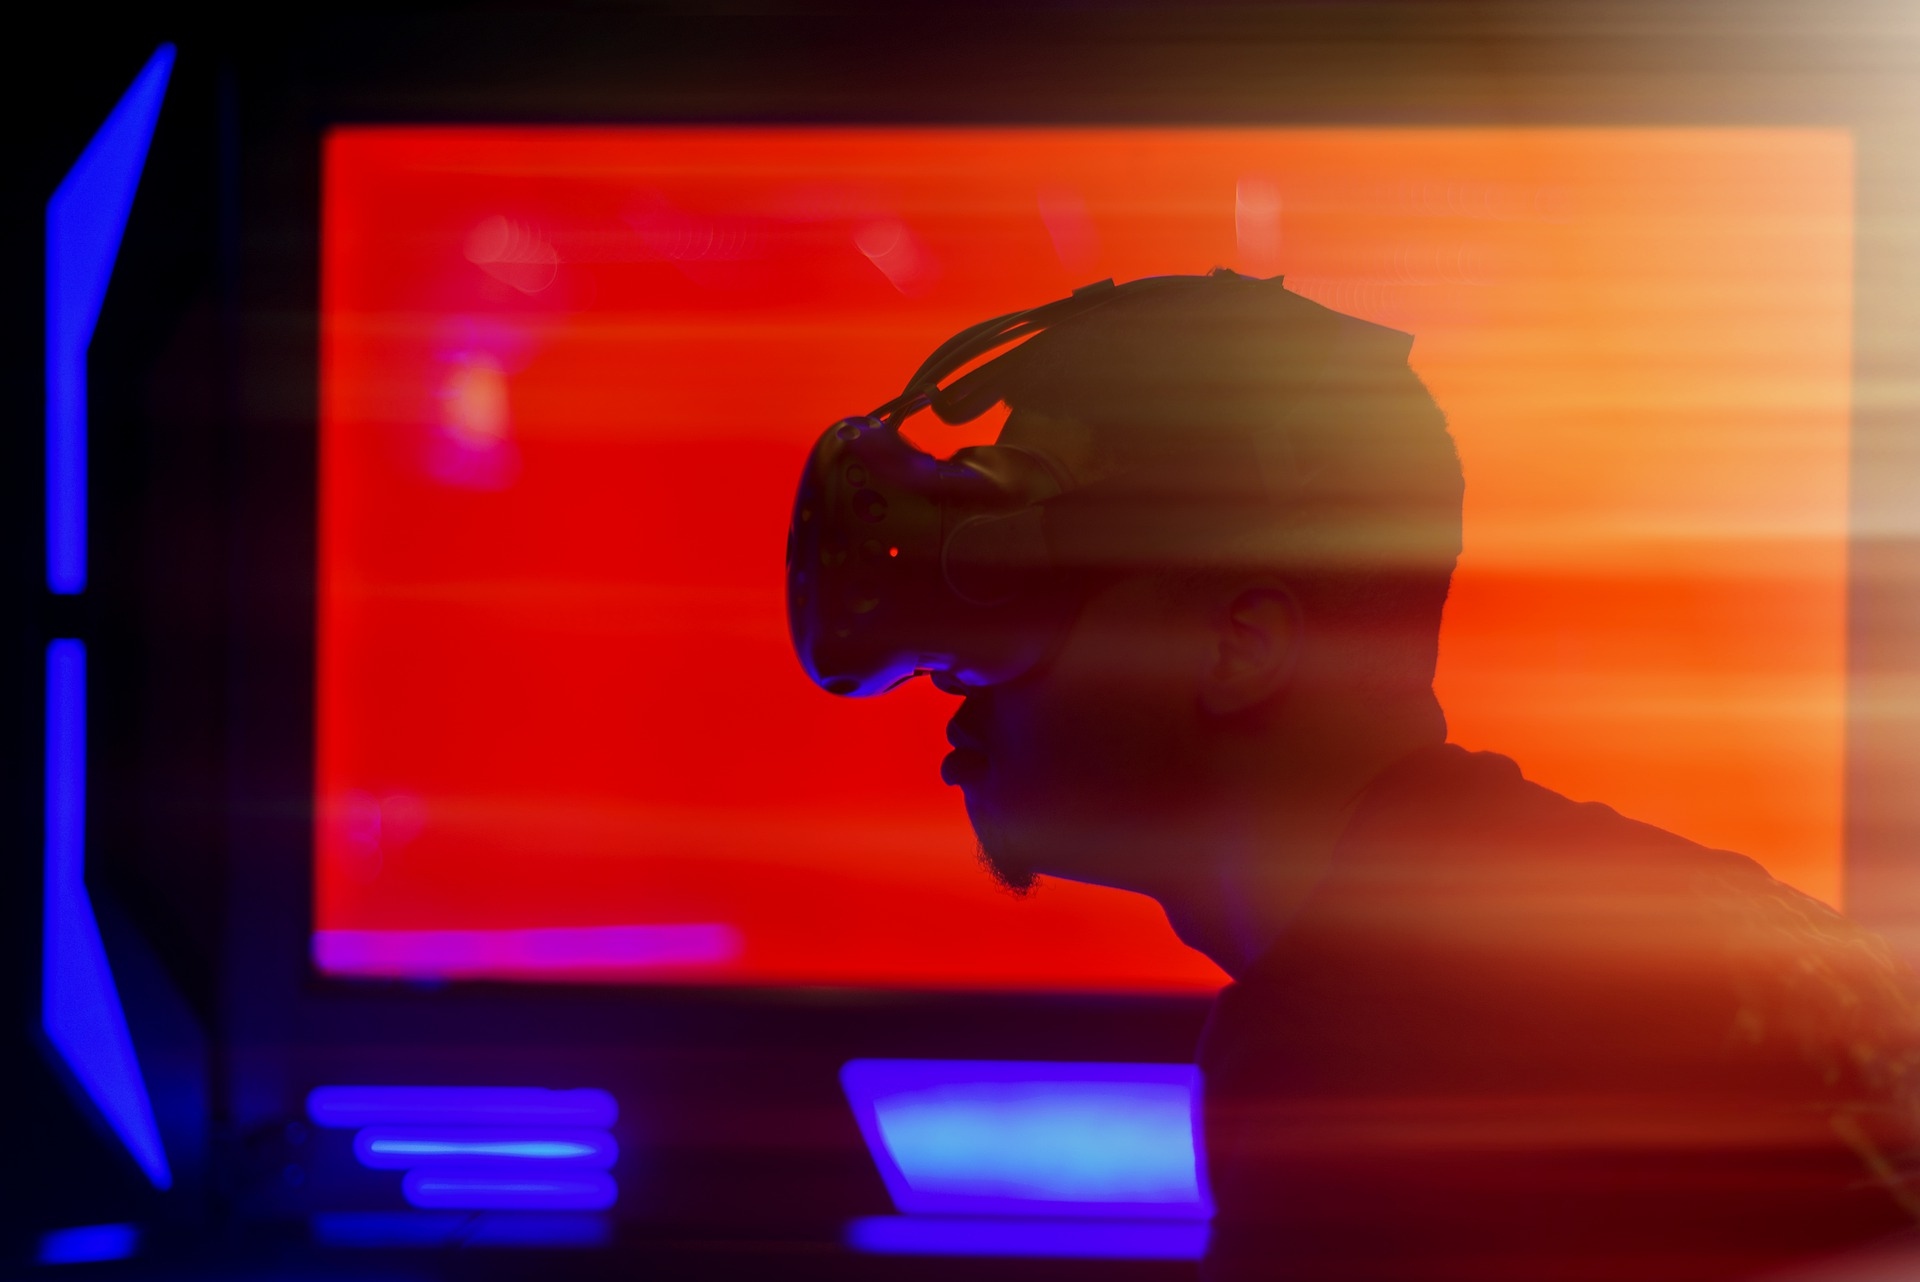 virtual-reality-4995294_1920.jpg